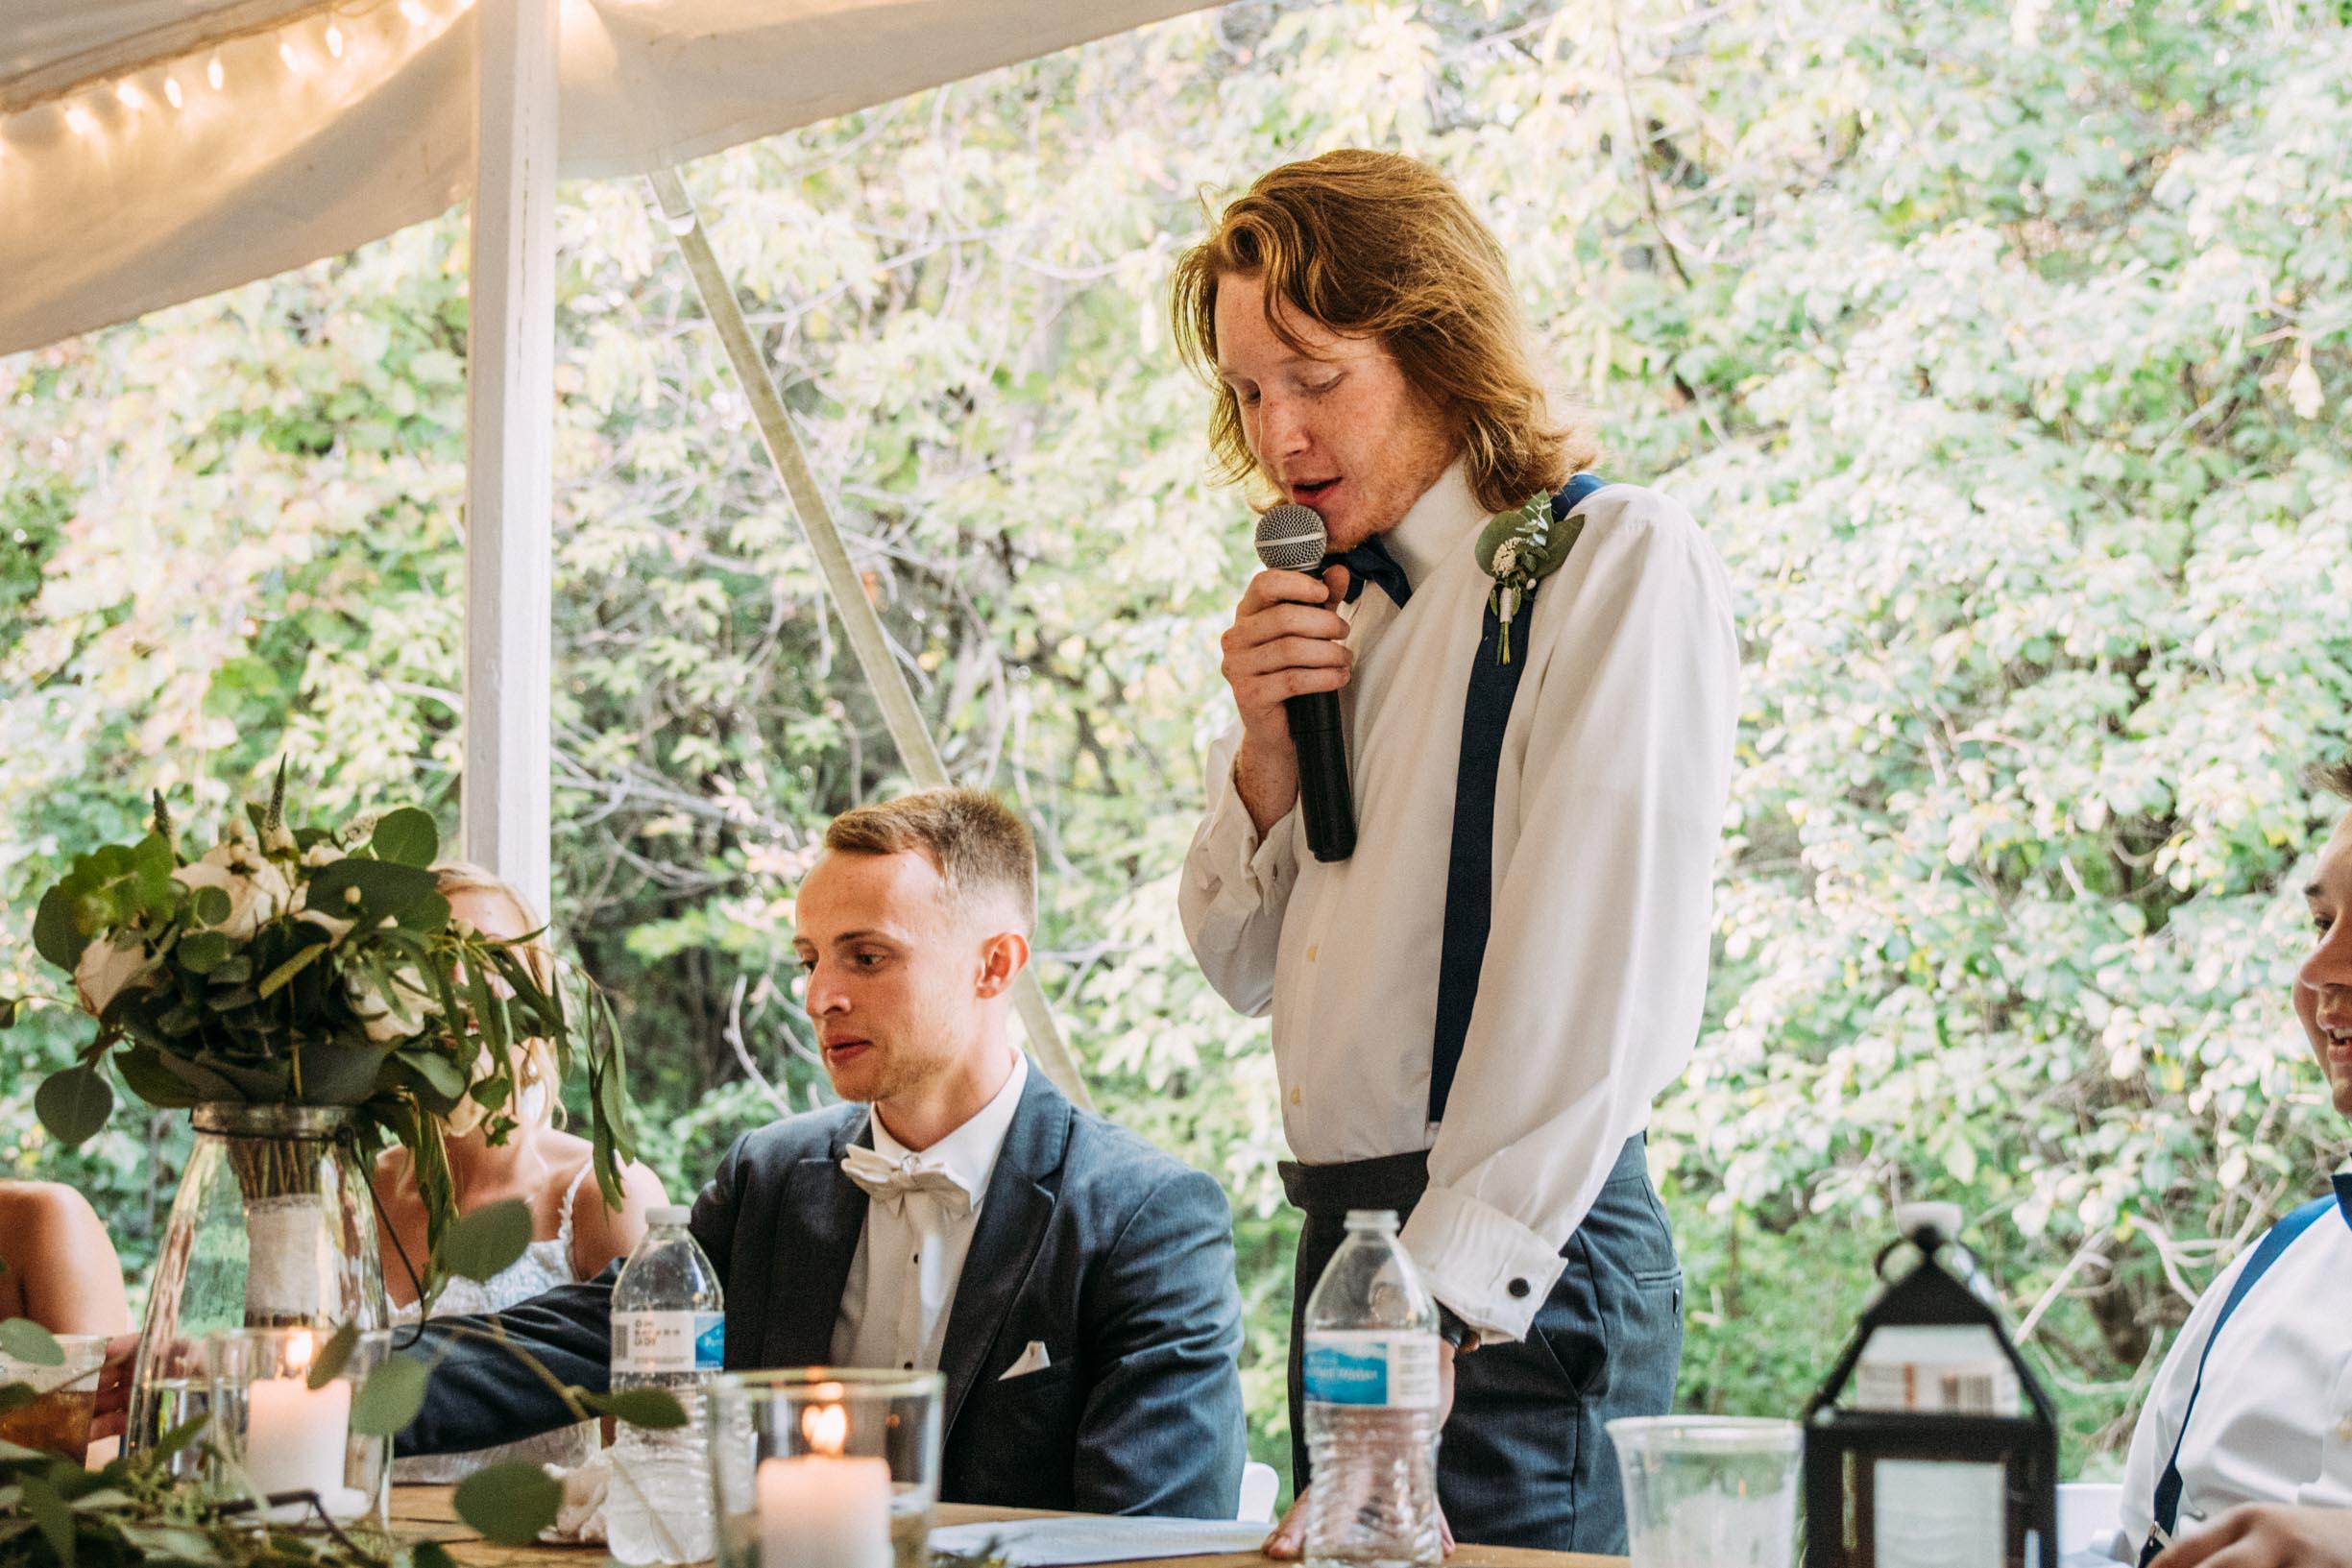 29-Minnetonka Orchards Wedding Ashley Bryce Blog.jpg